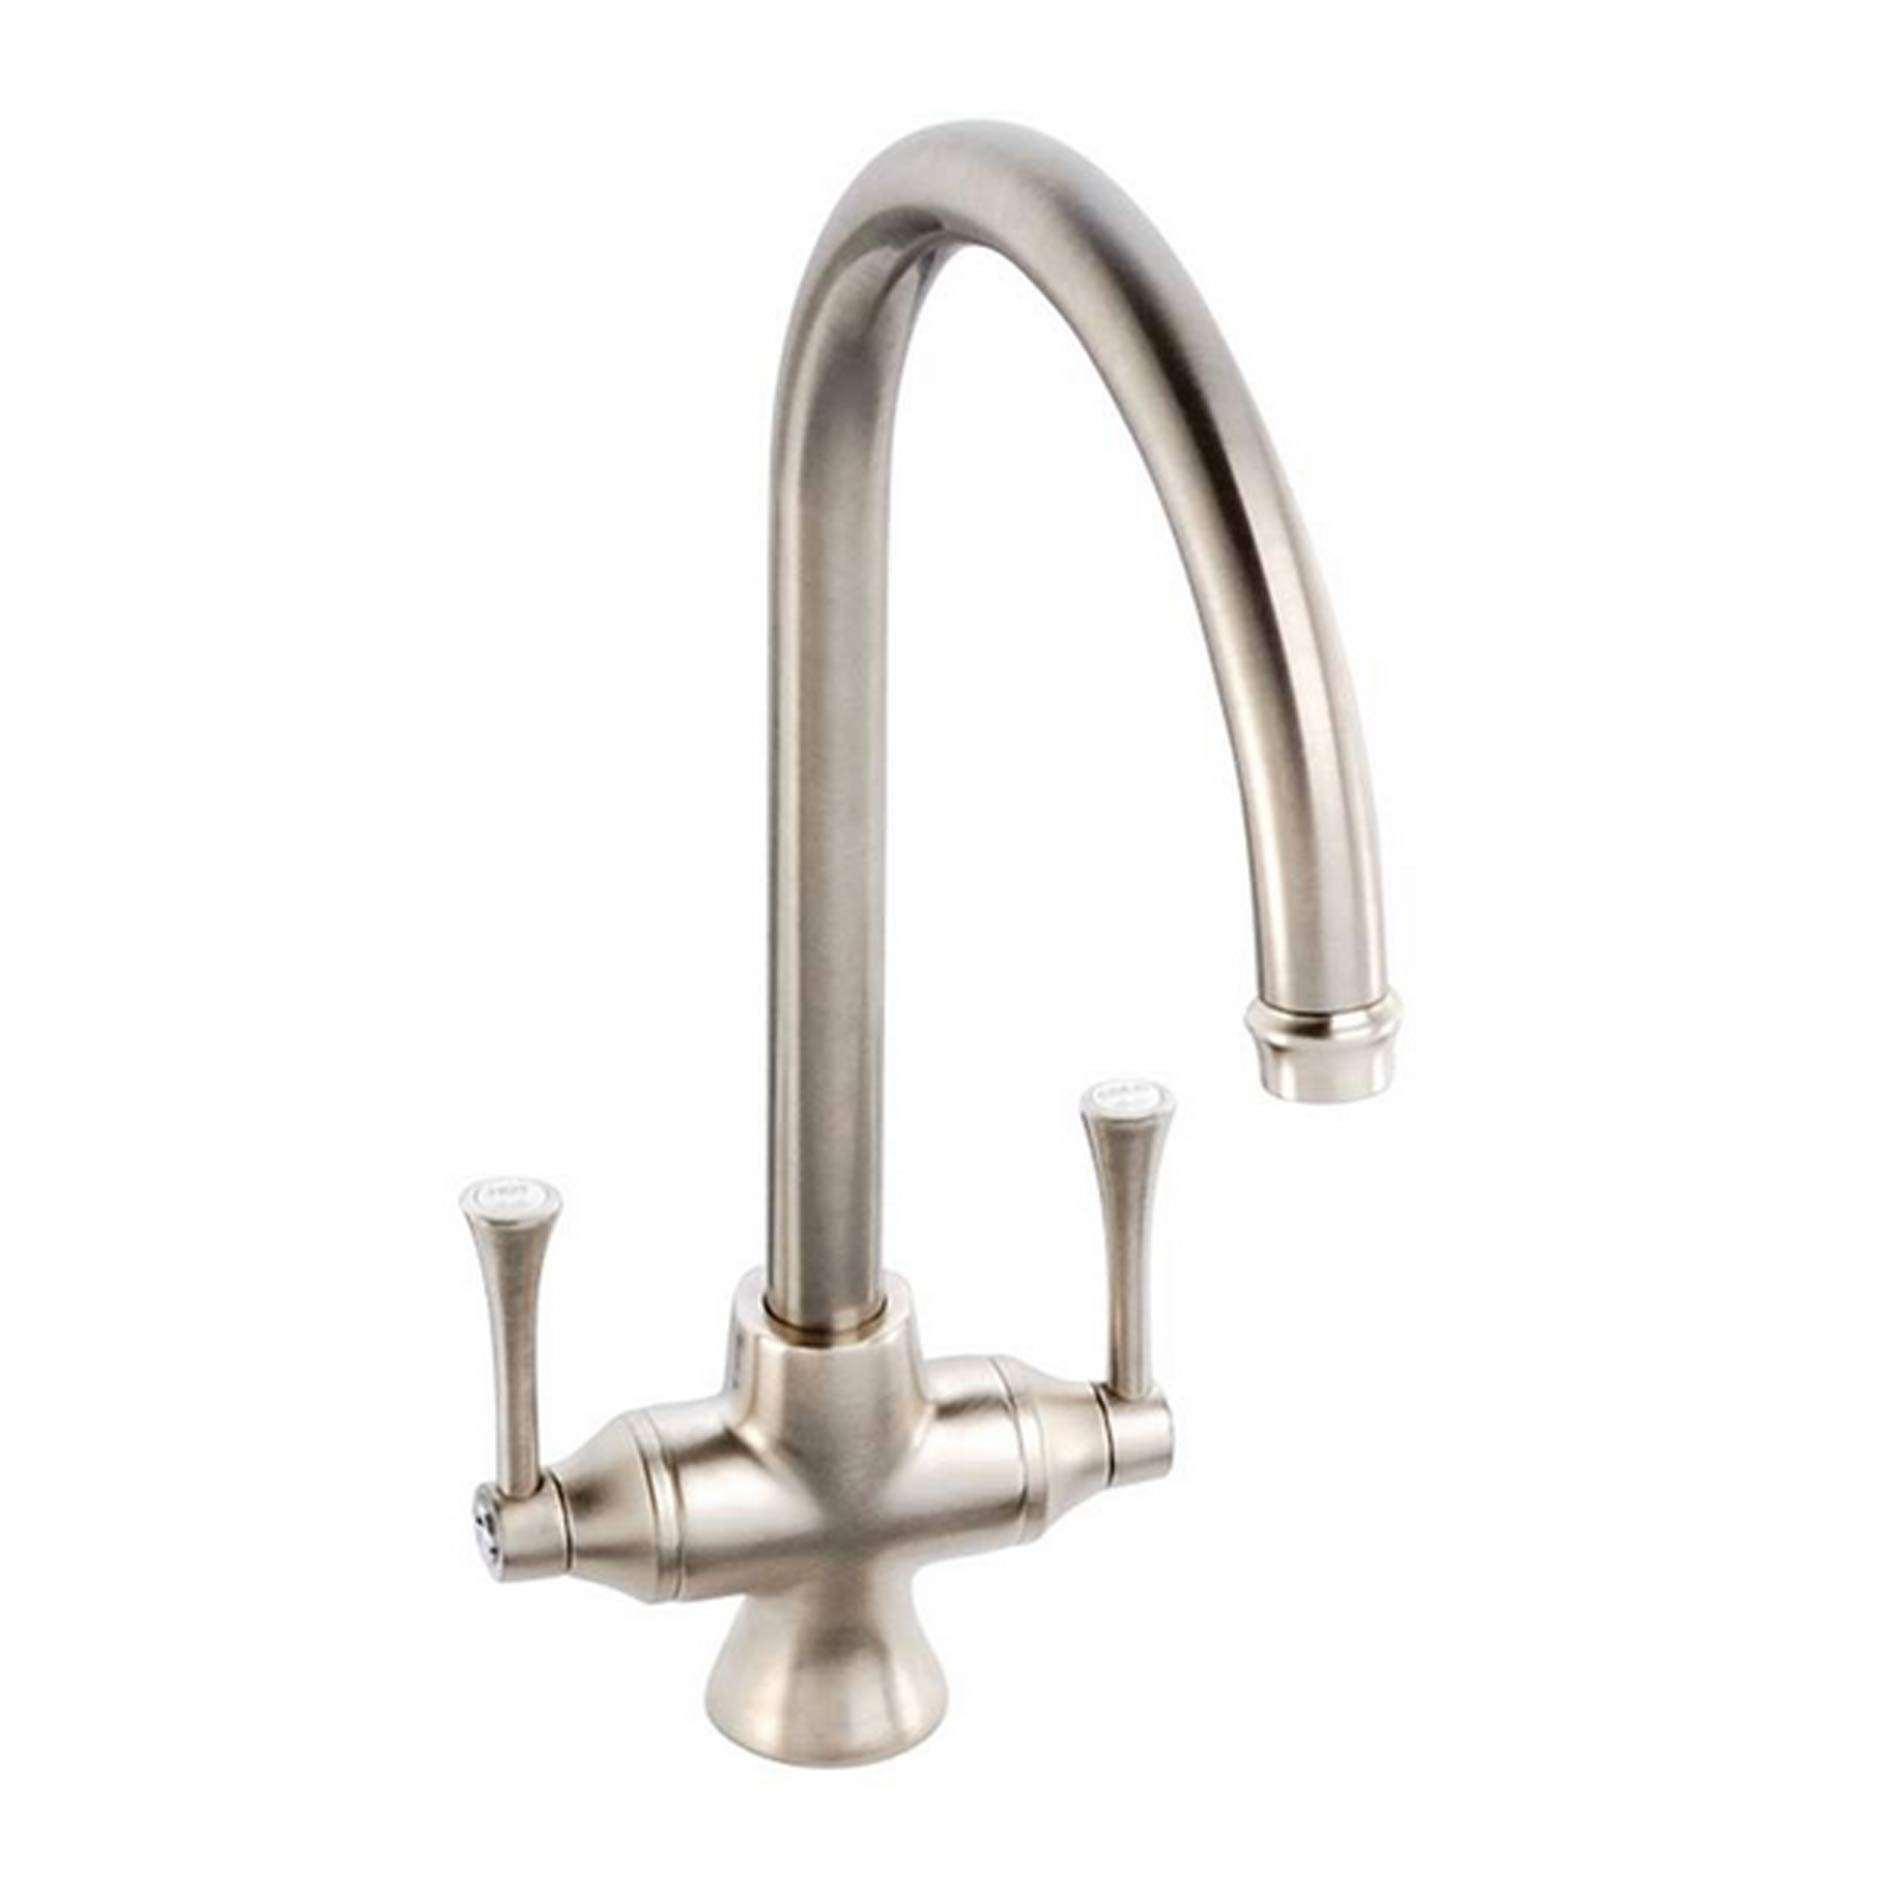 Clearwater: Regent Brushed Nickel Tap - Kitchen Sinks & Taps